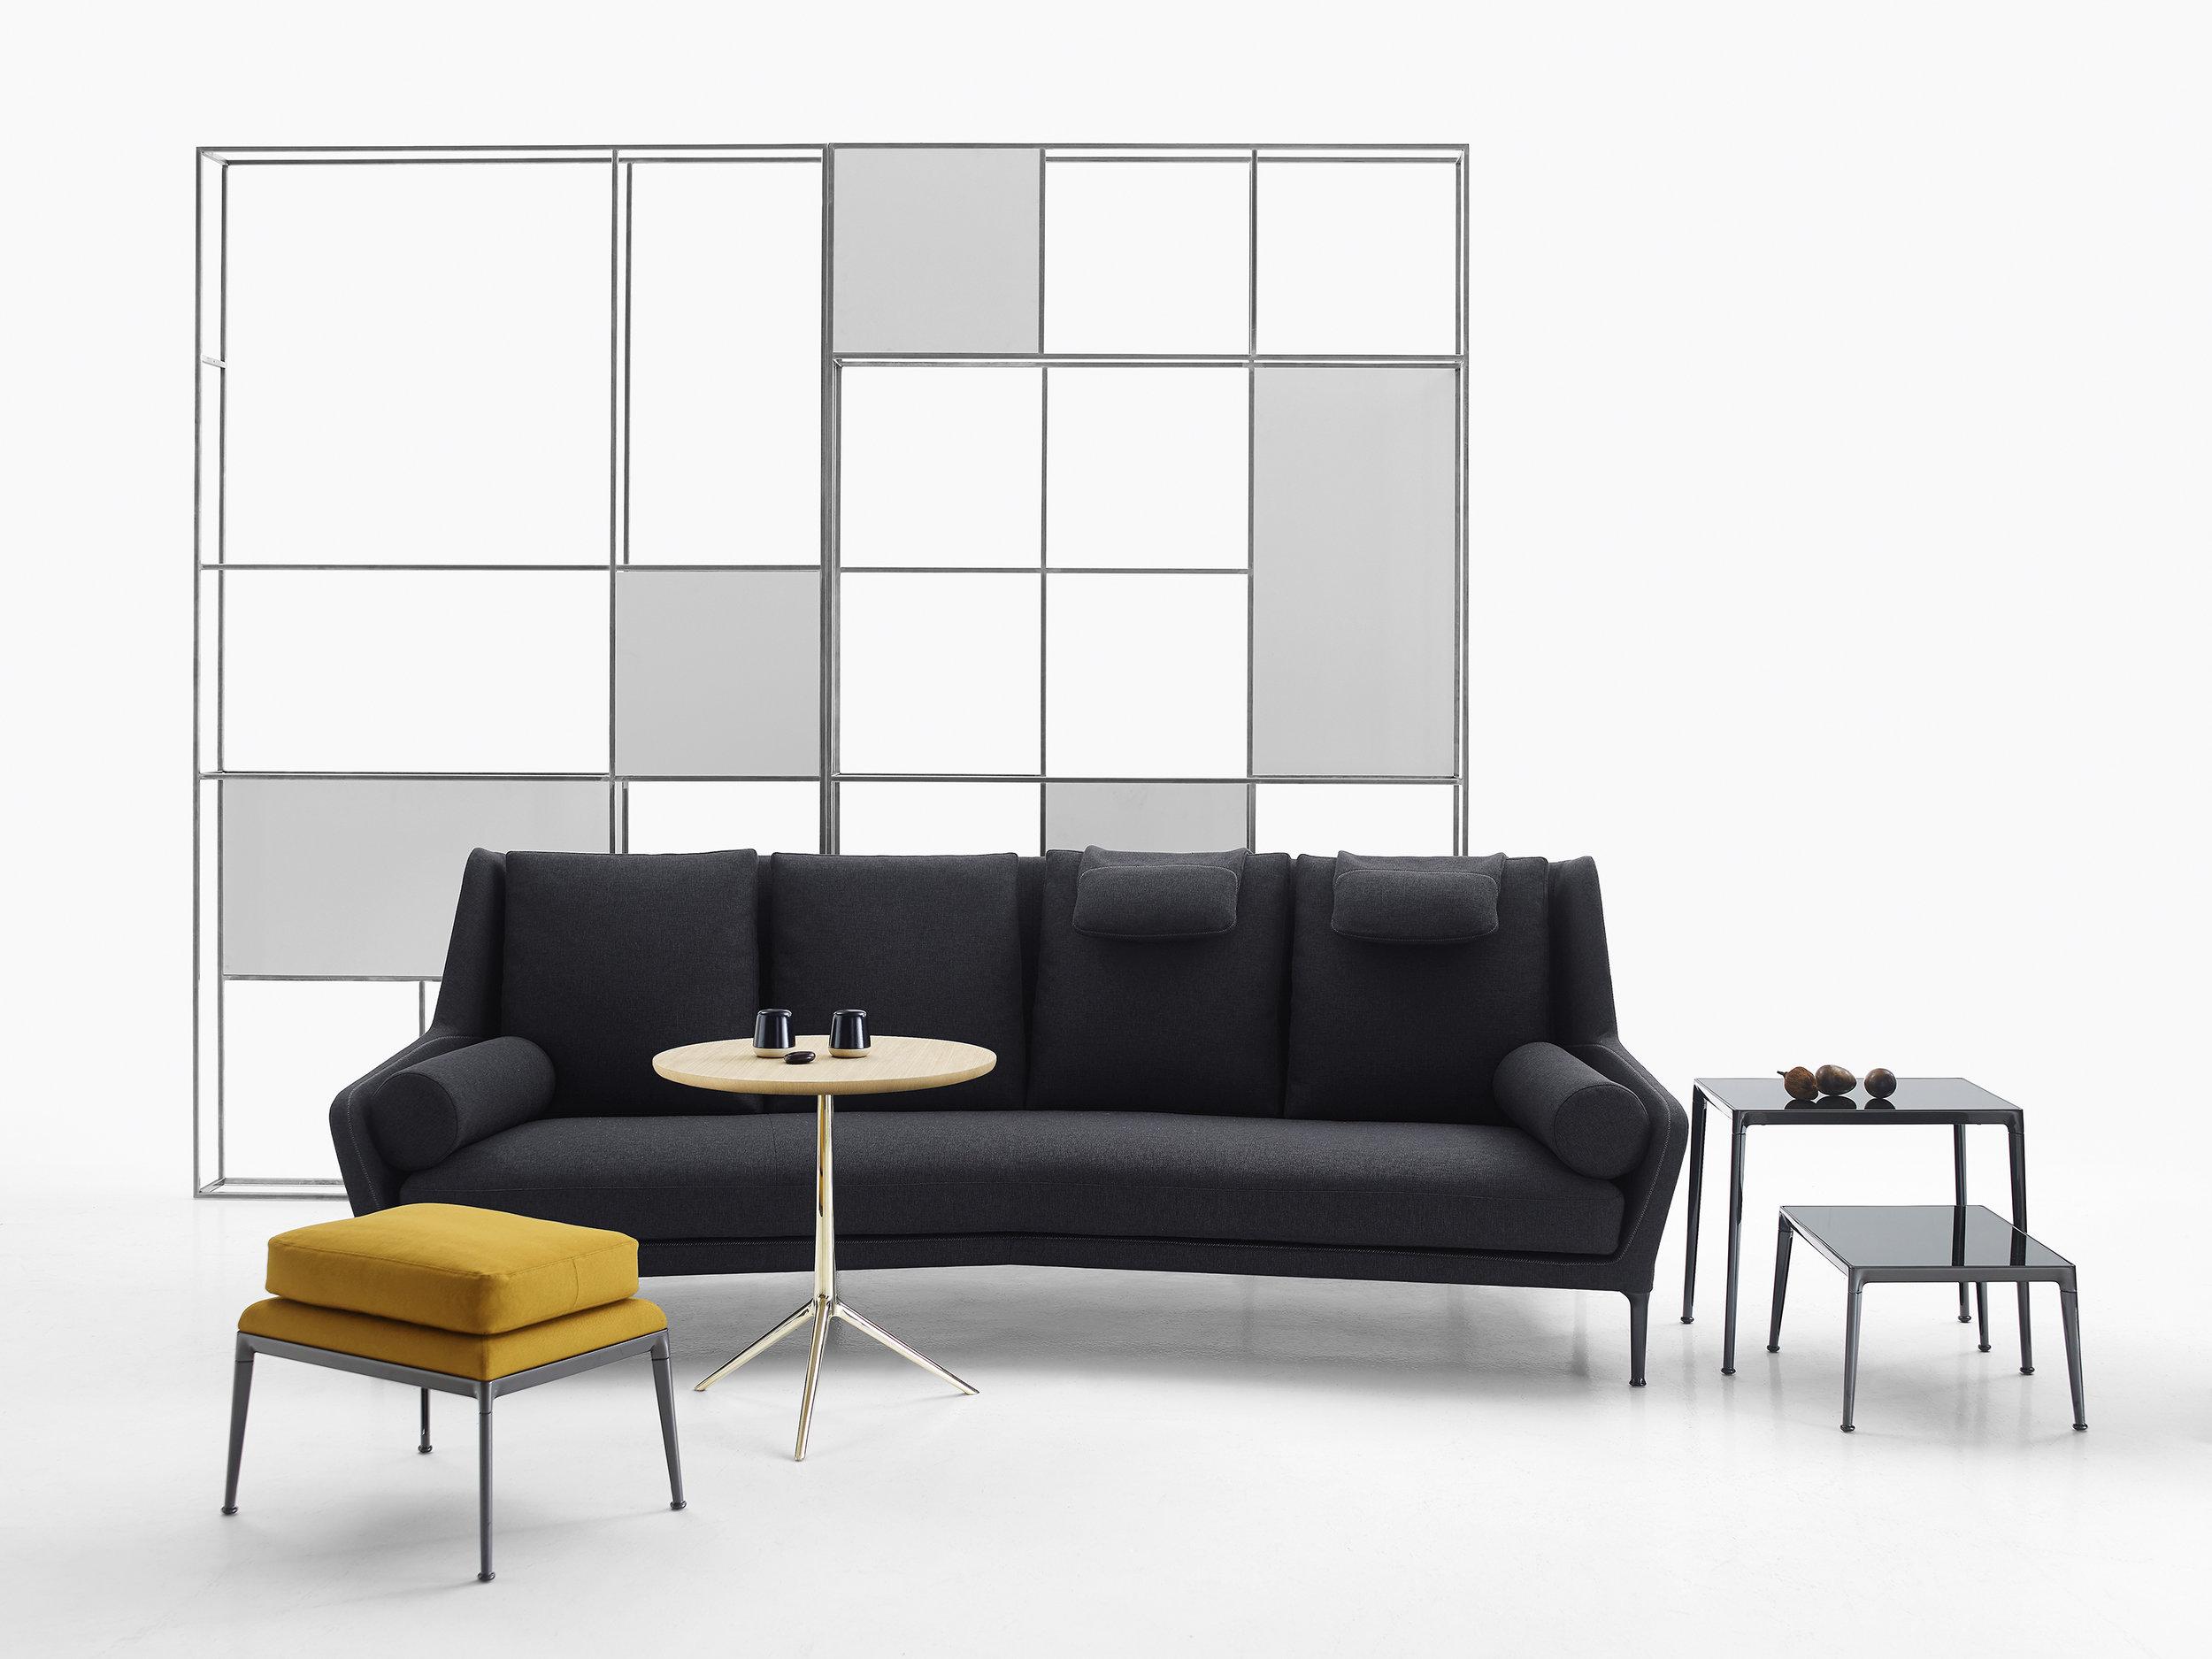 Antonio Citterio's most recent sofa design for B&B Italia - the  Édouard sofa .